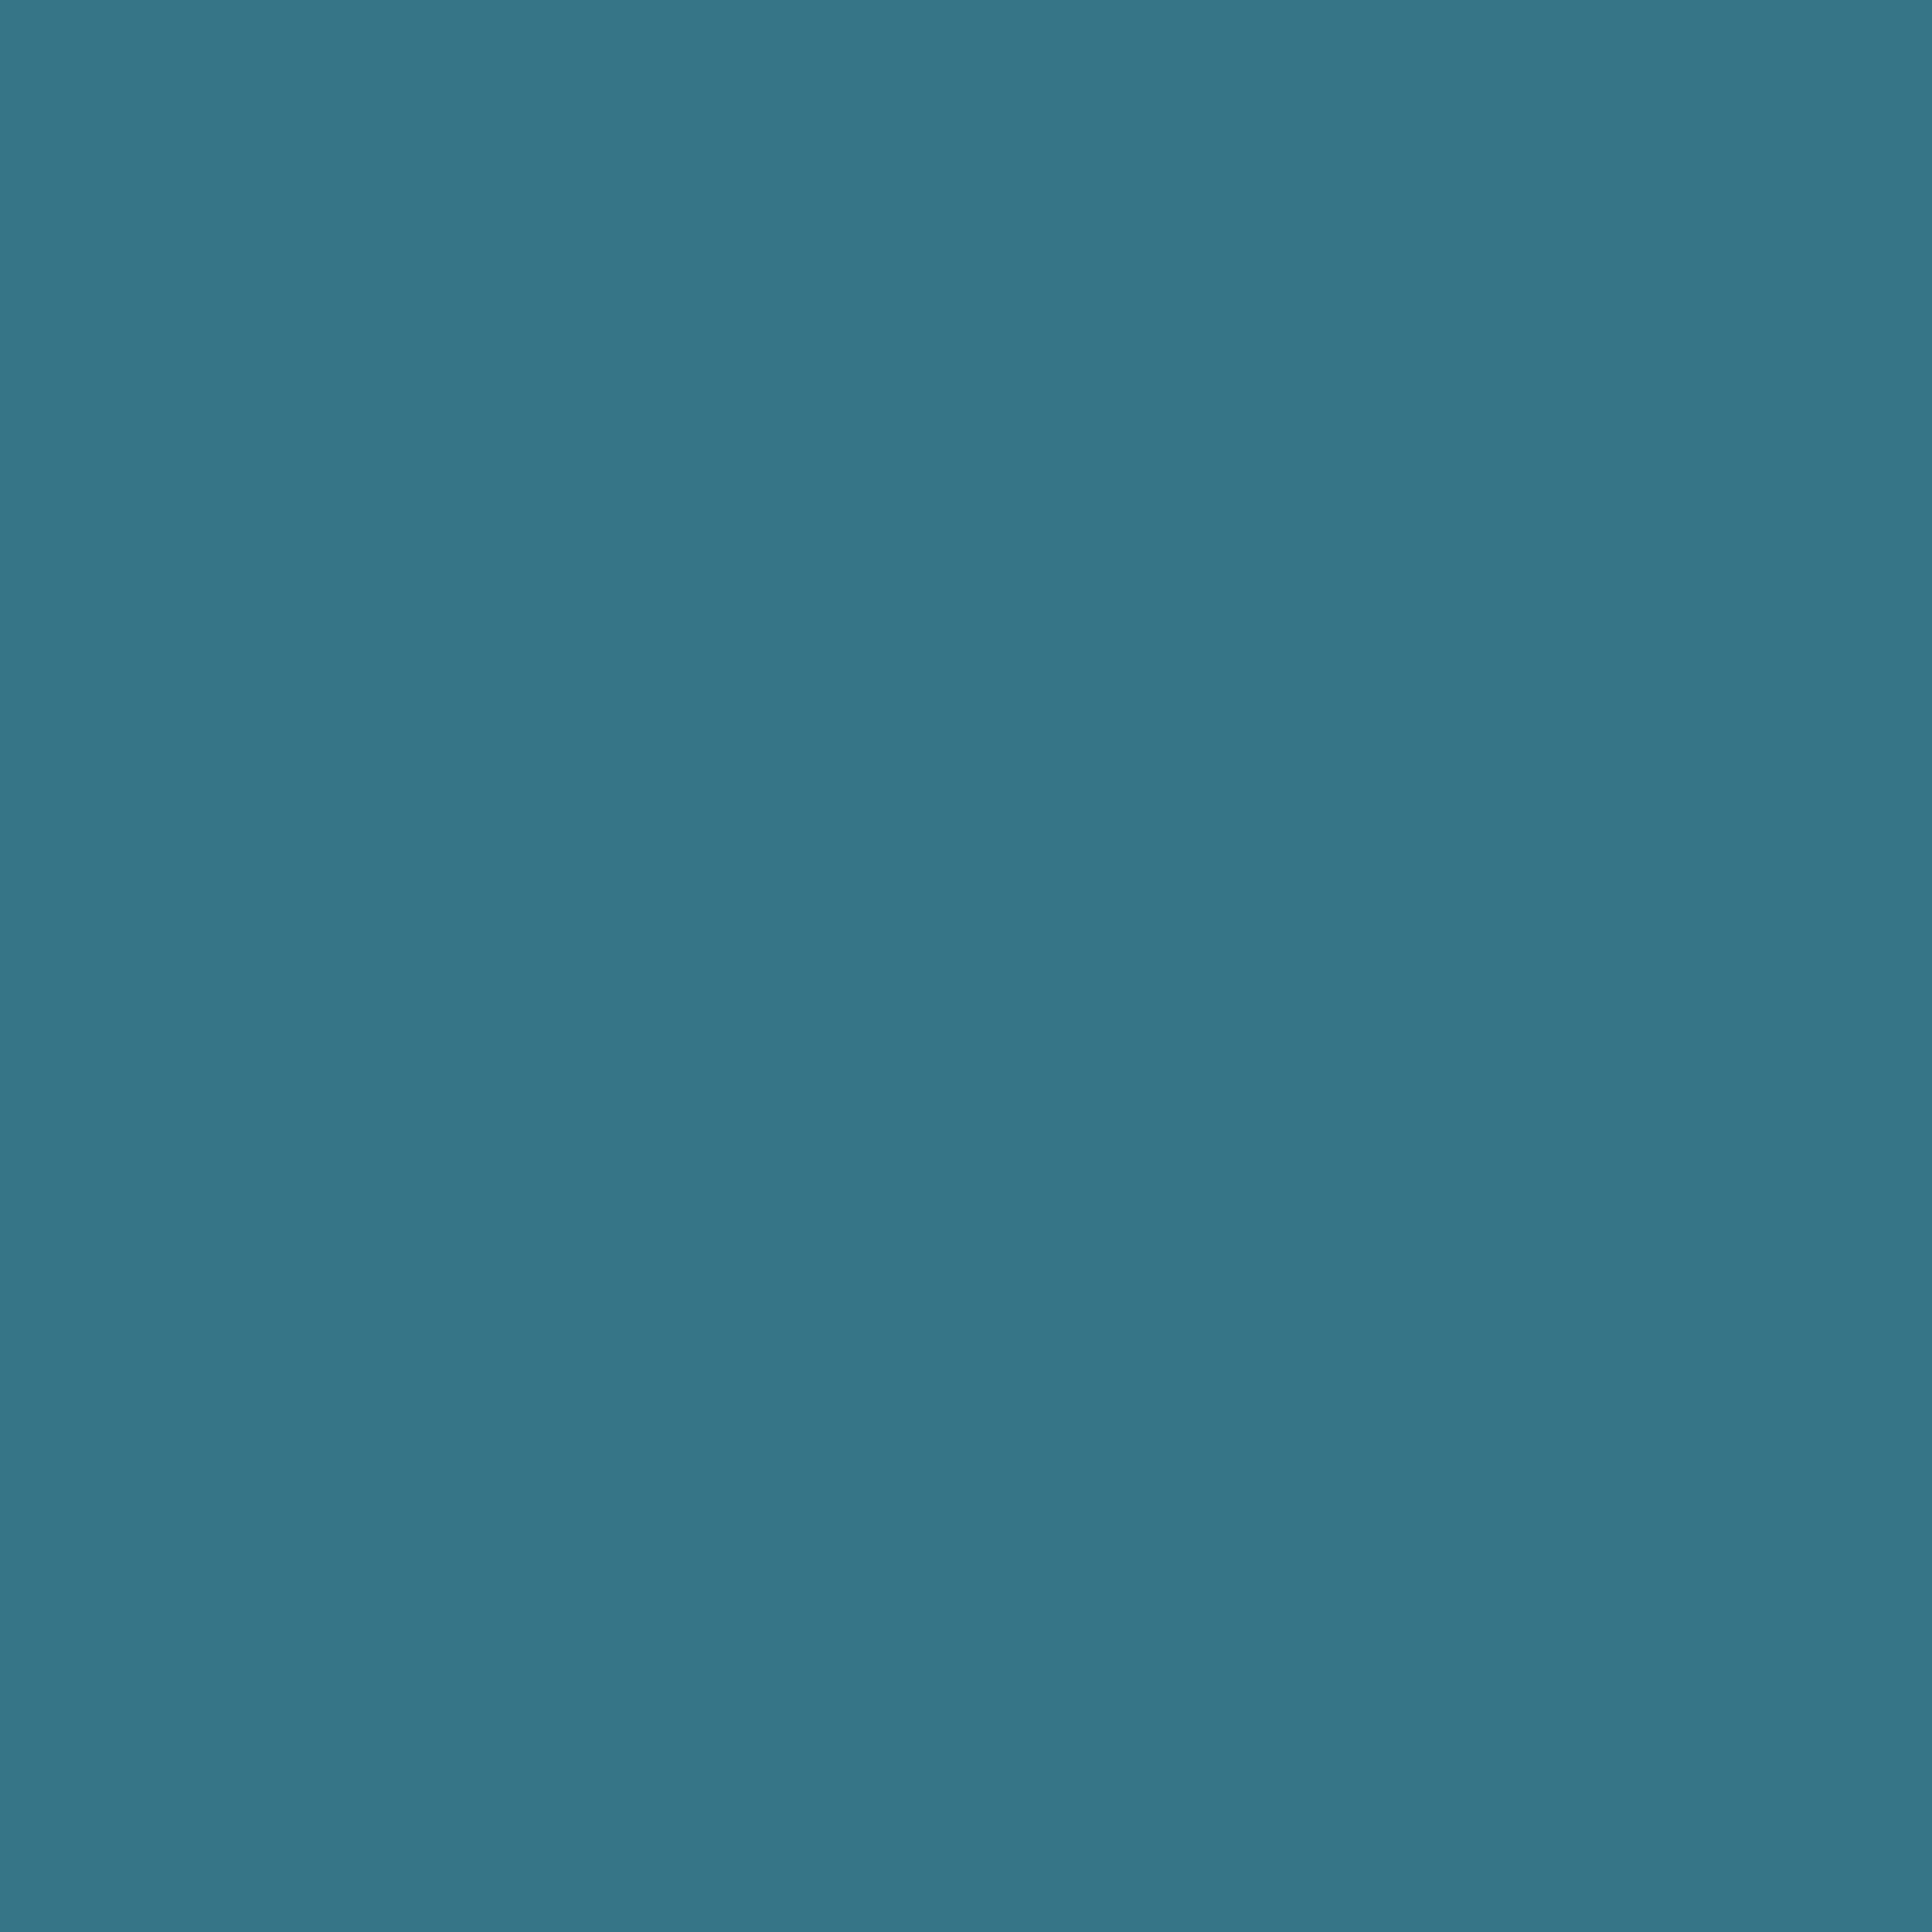 2732x2732 Teal Blue Solid Color Background